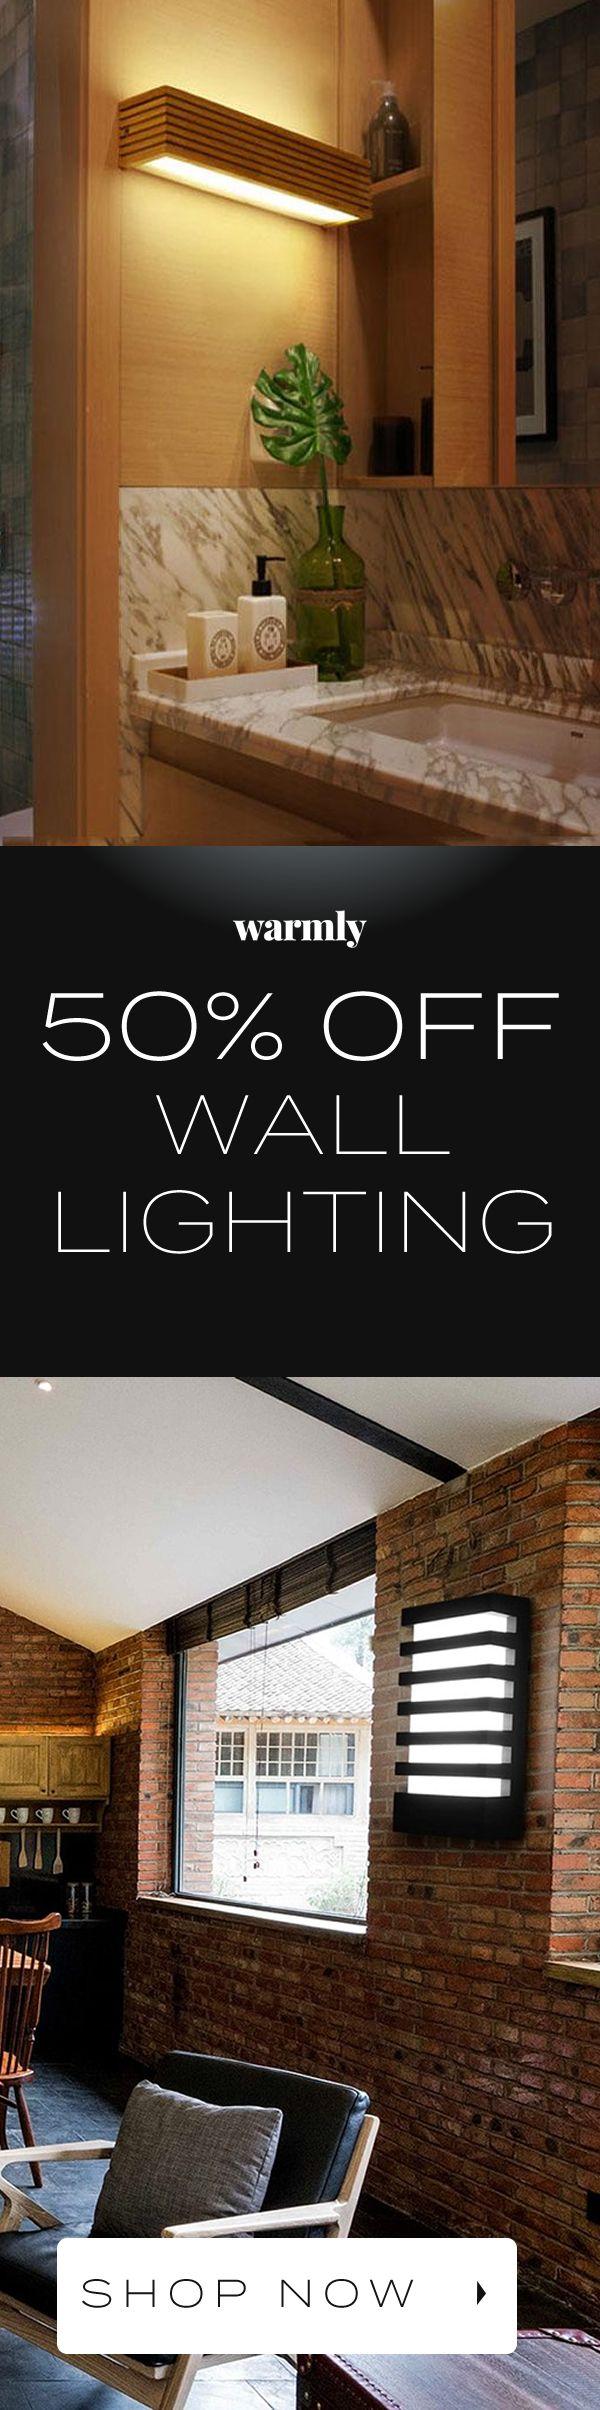 50% Off Wall Lighting at Warmly – ★★★★★ (5/5)